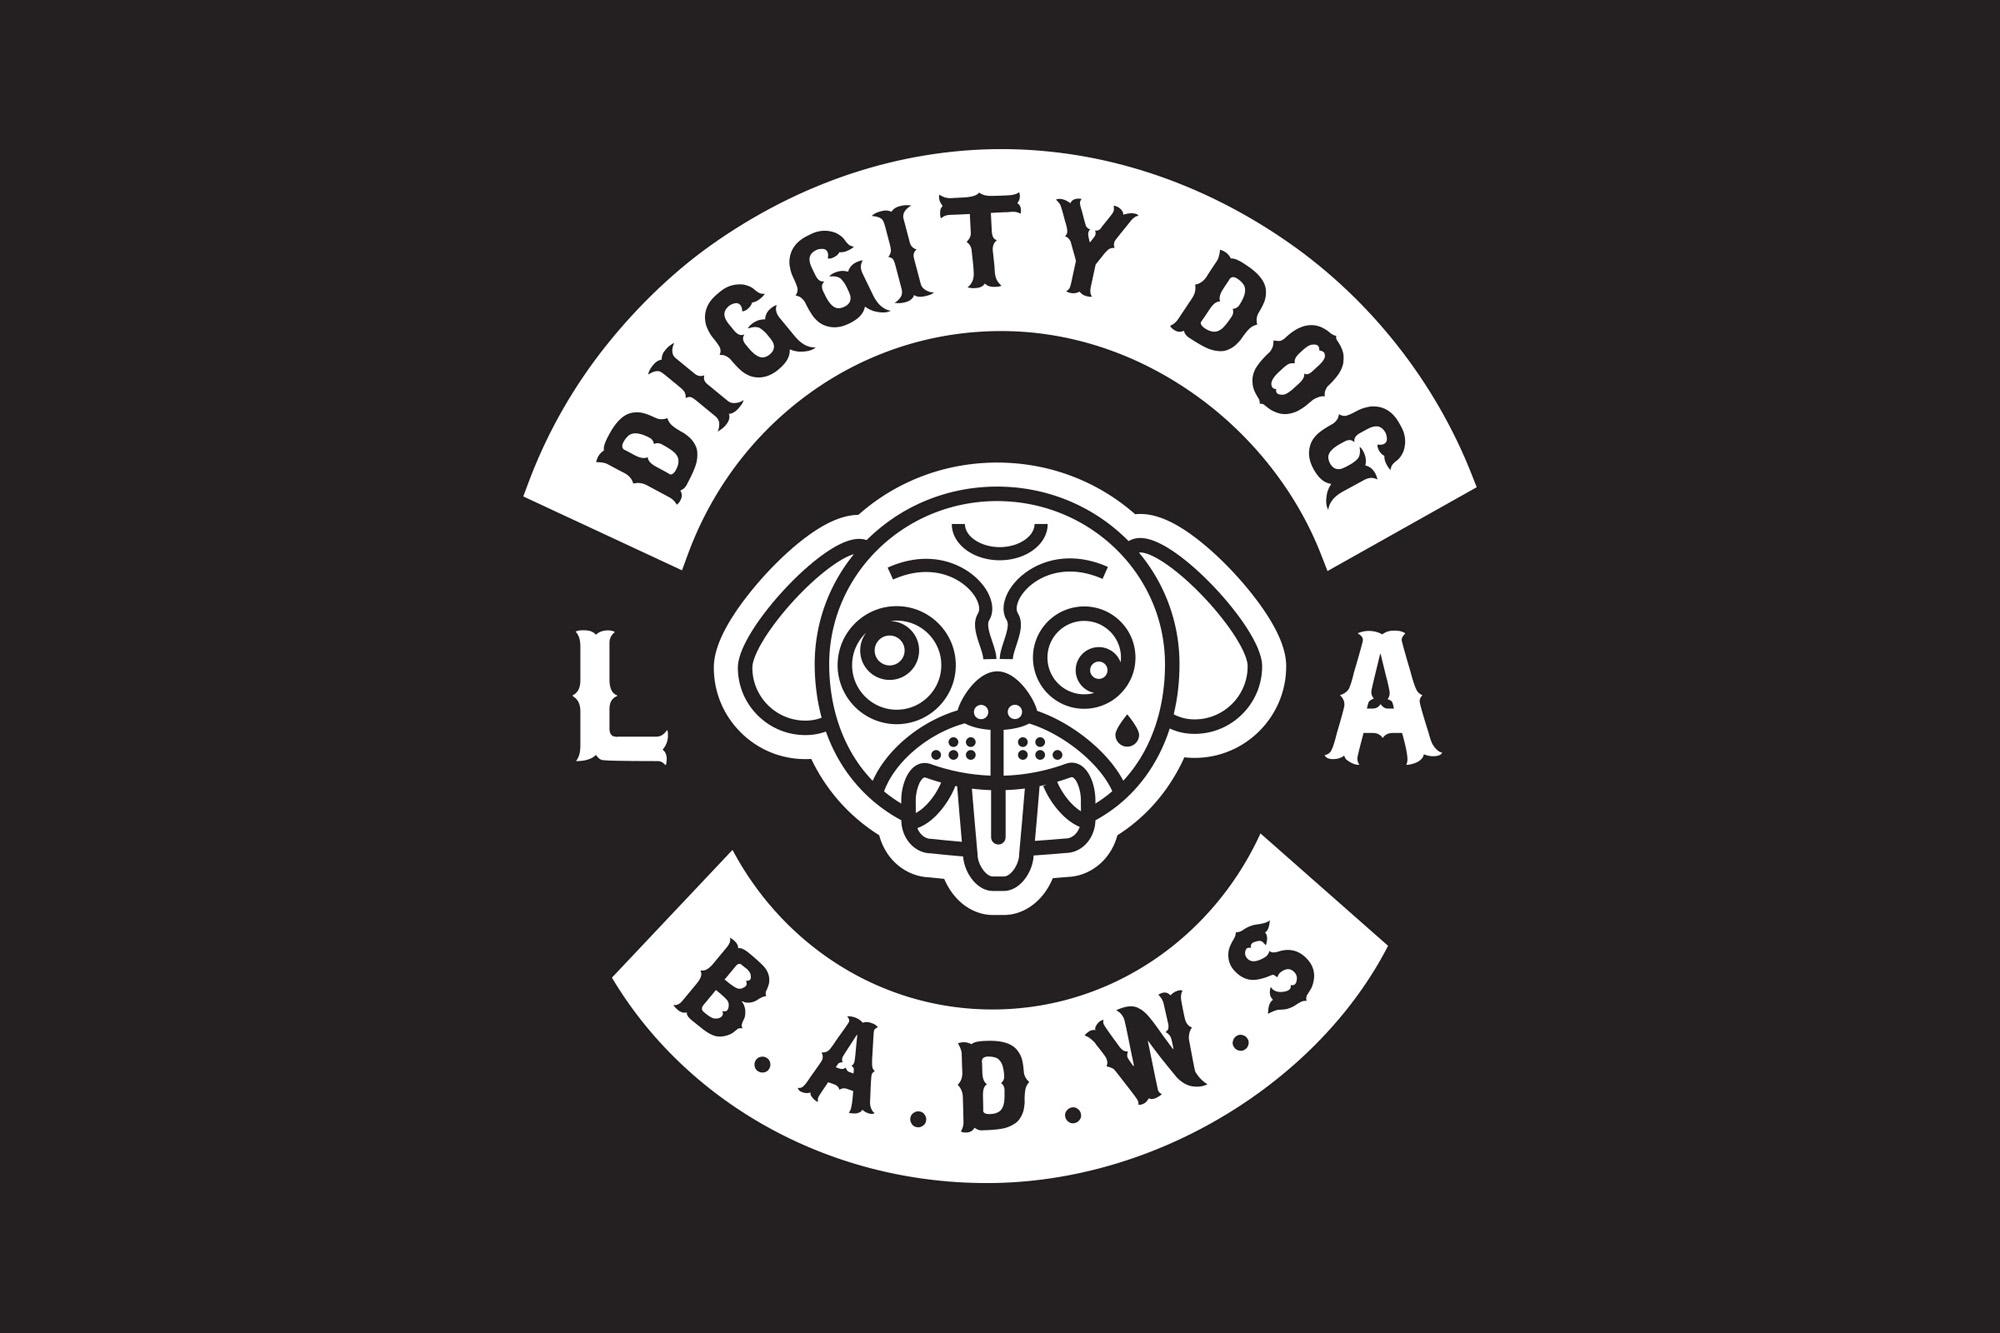 Diggity Dog